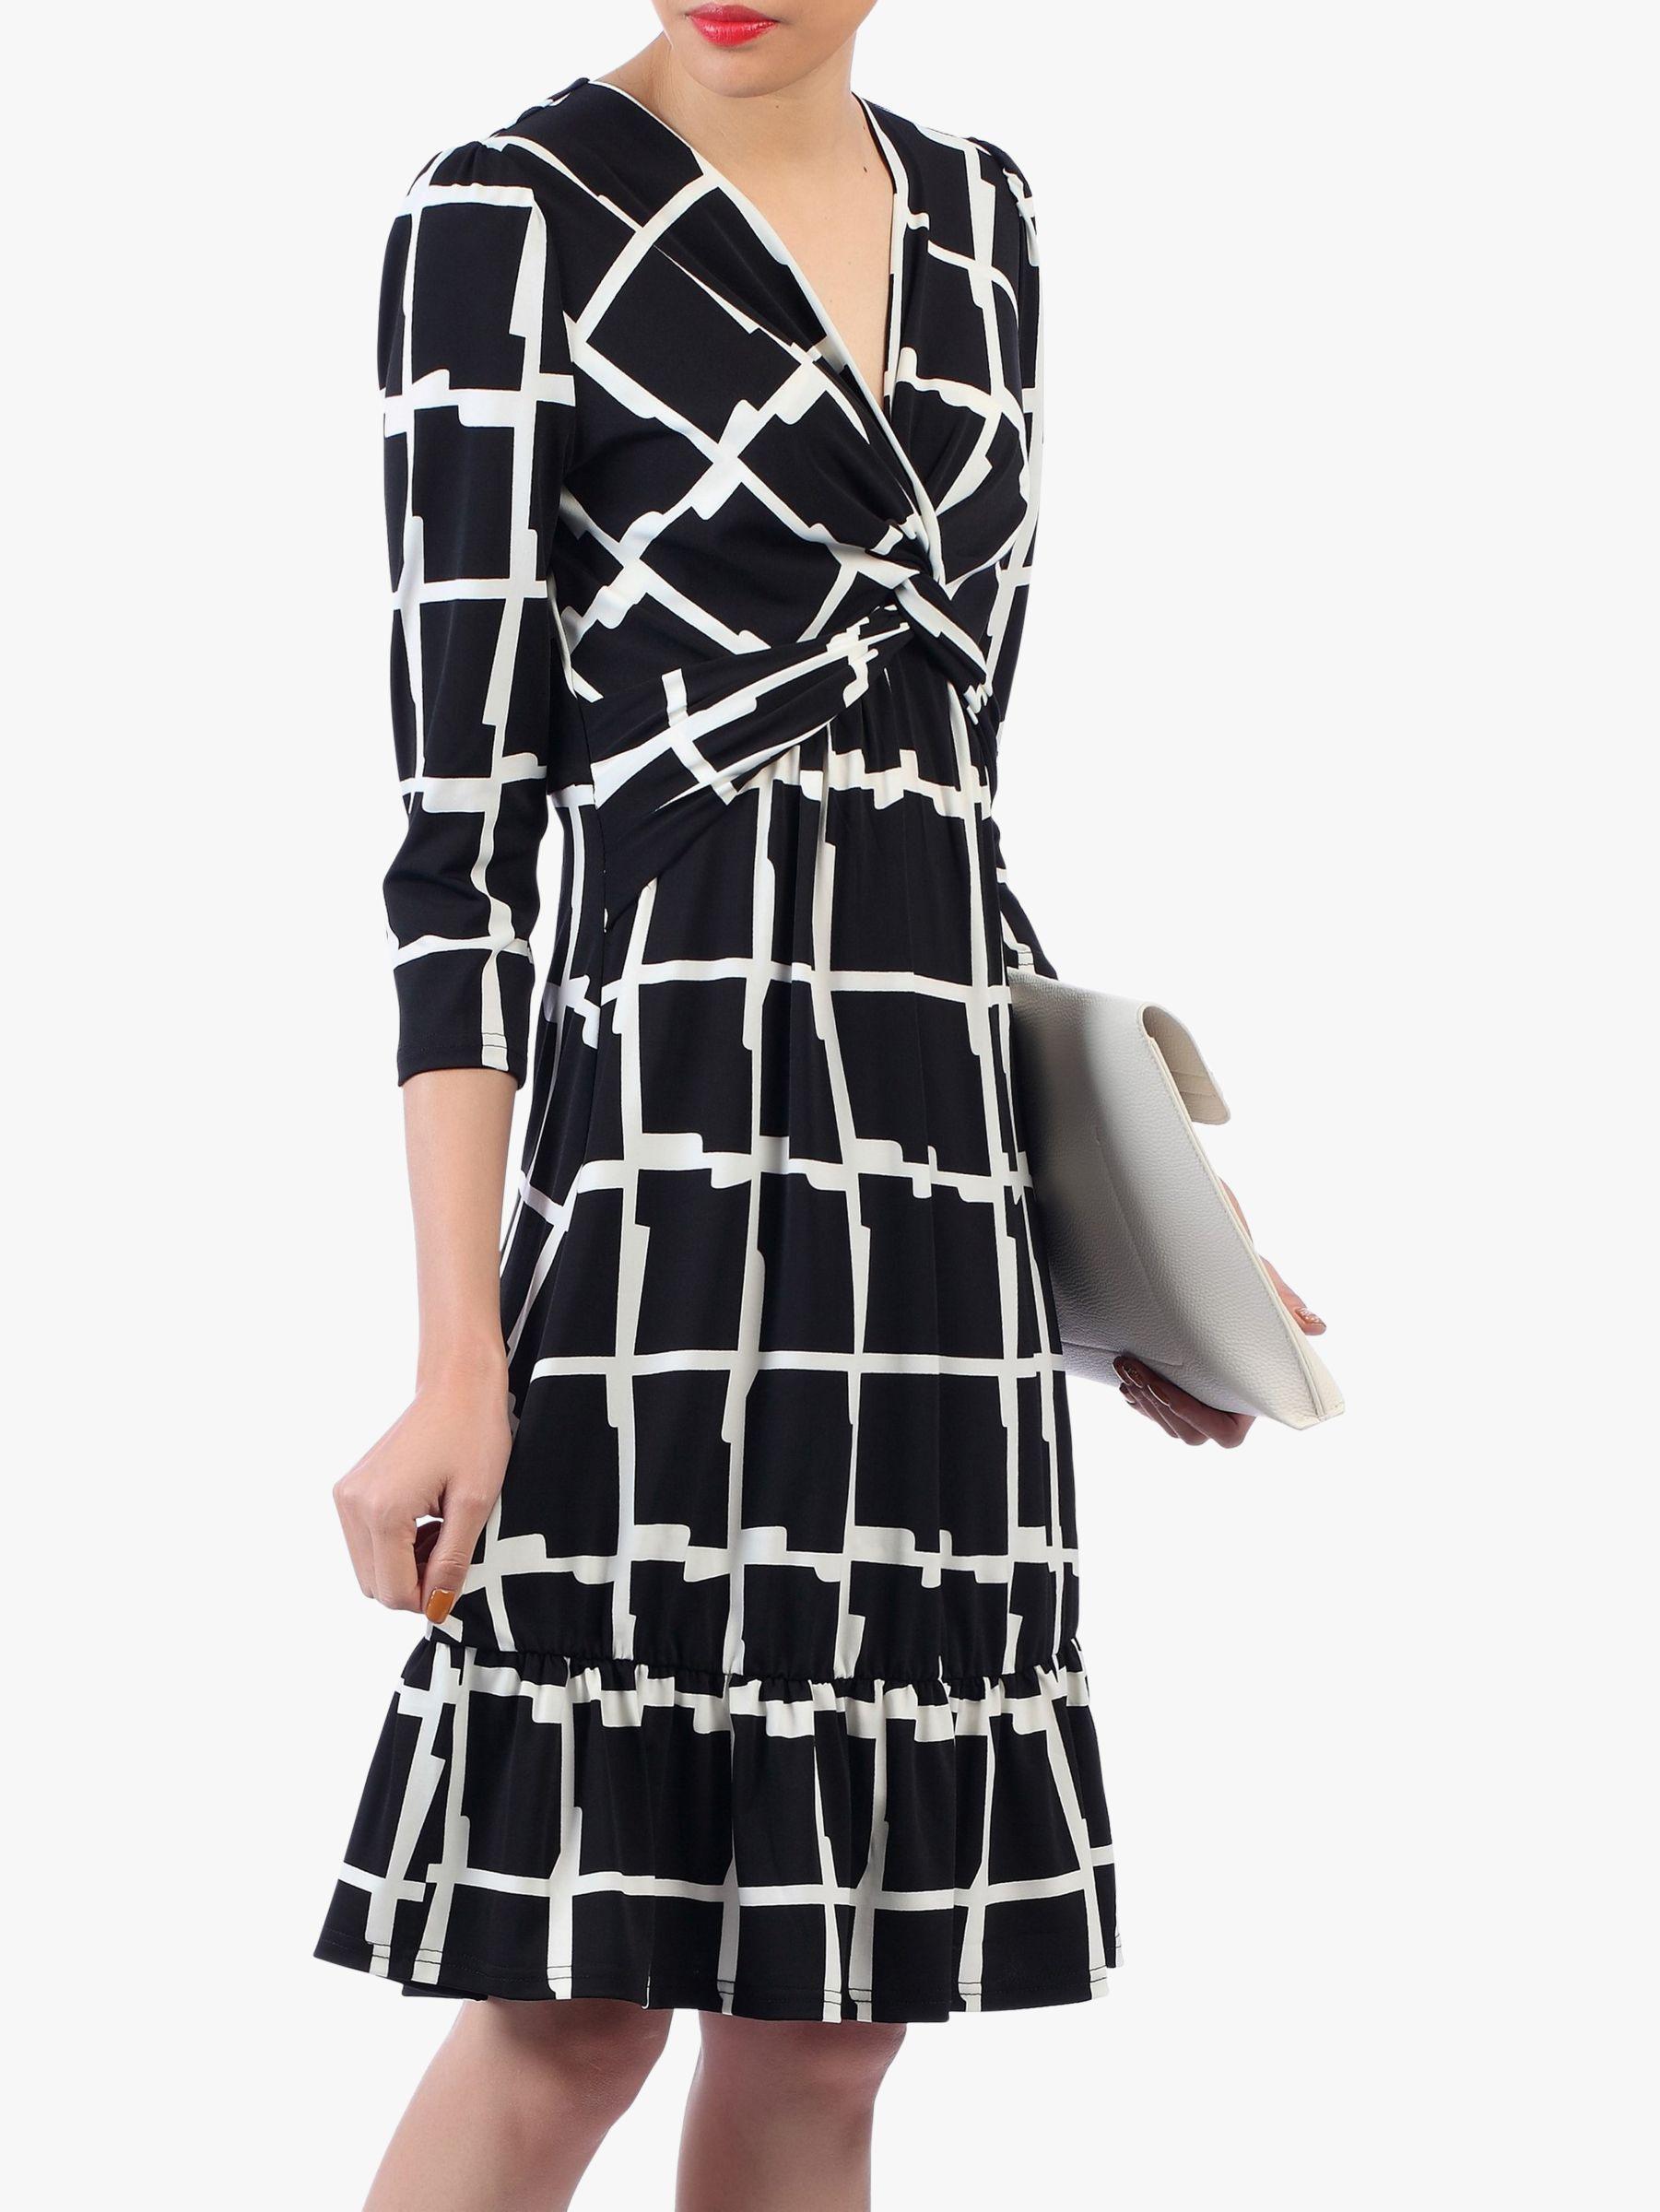 0d0202587ed2d Jolie Moi Twist Front Flare Dress in Black - Lyst